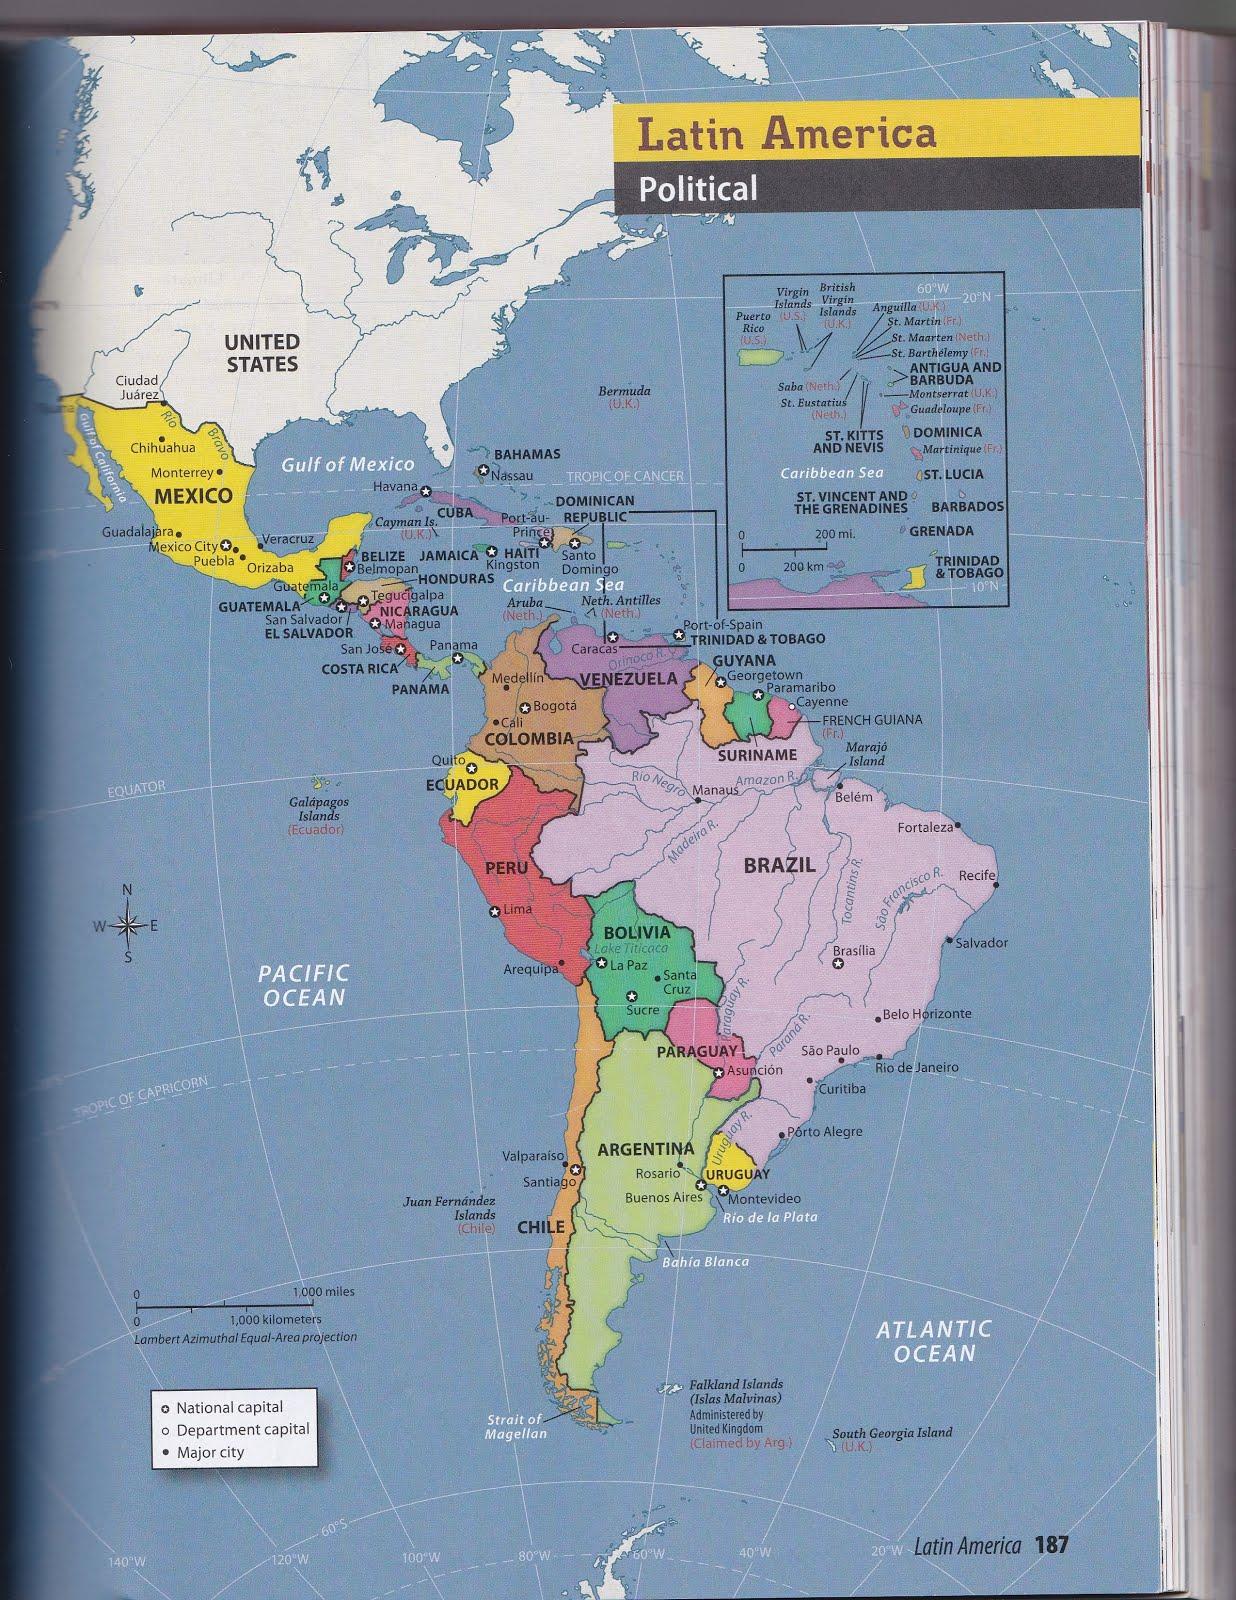 Mr Izor S Akins Geography Latin America Mapping Lab Part